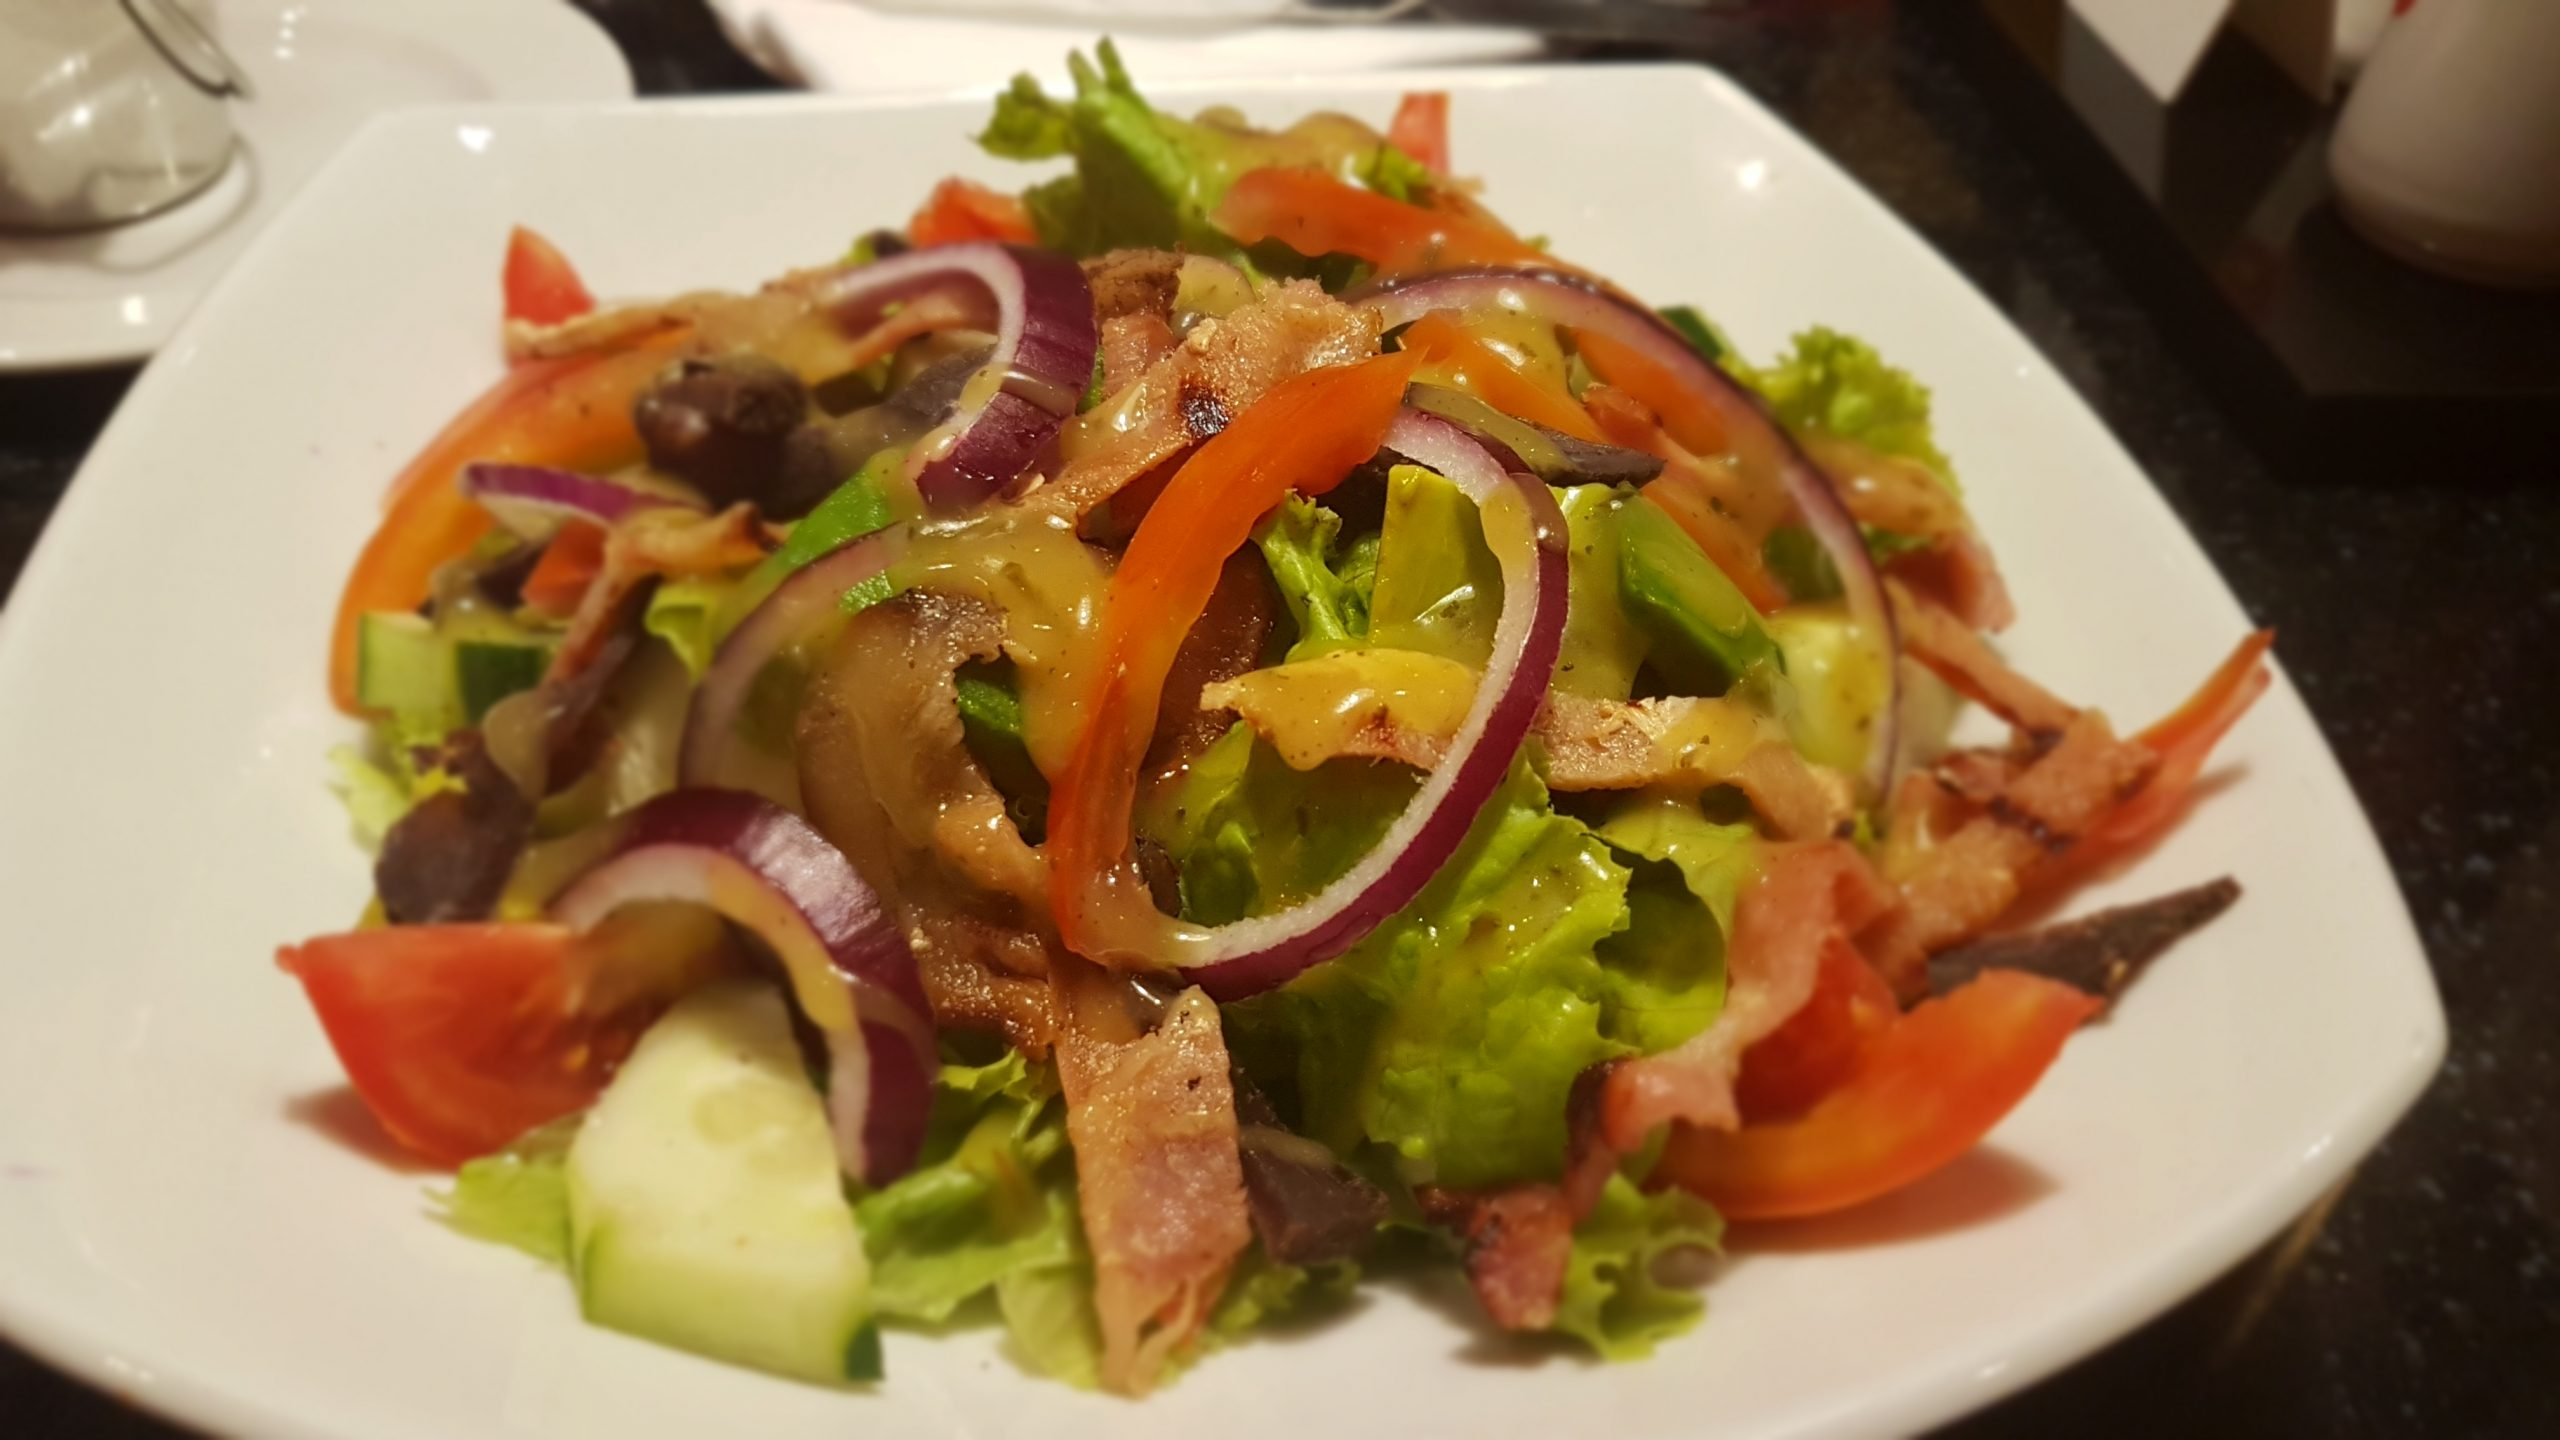 The B&B Salad